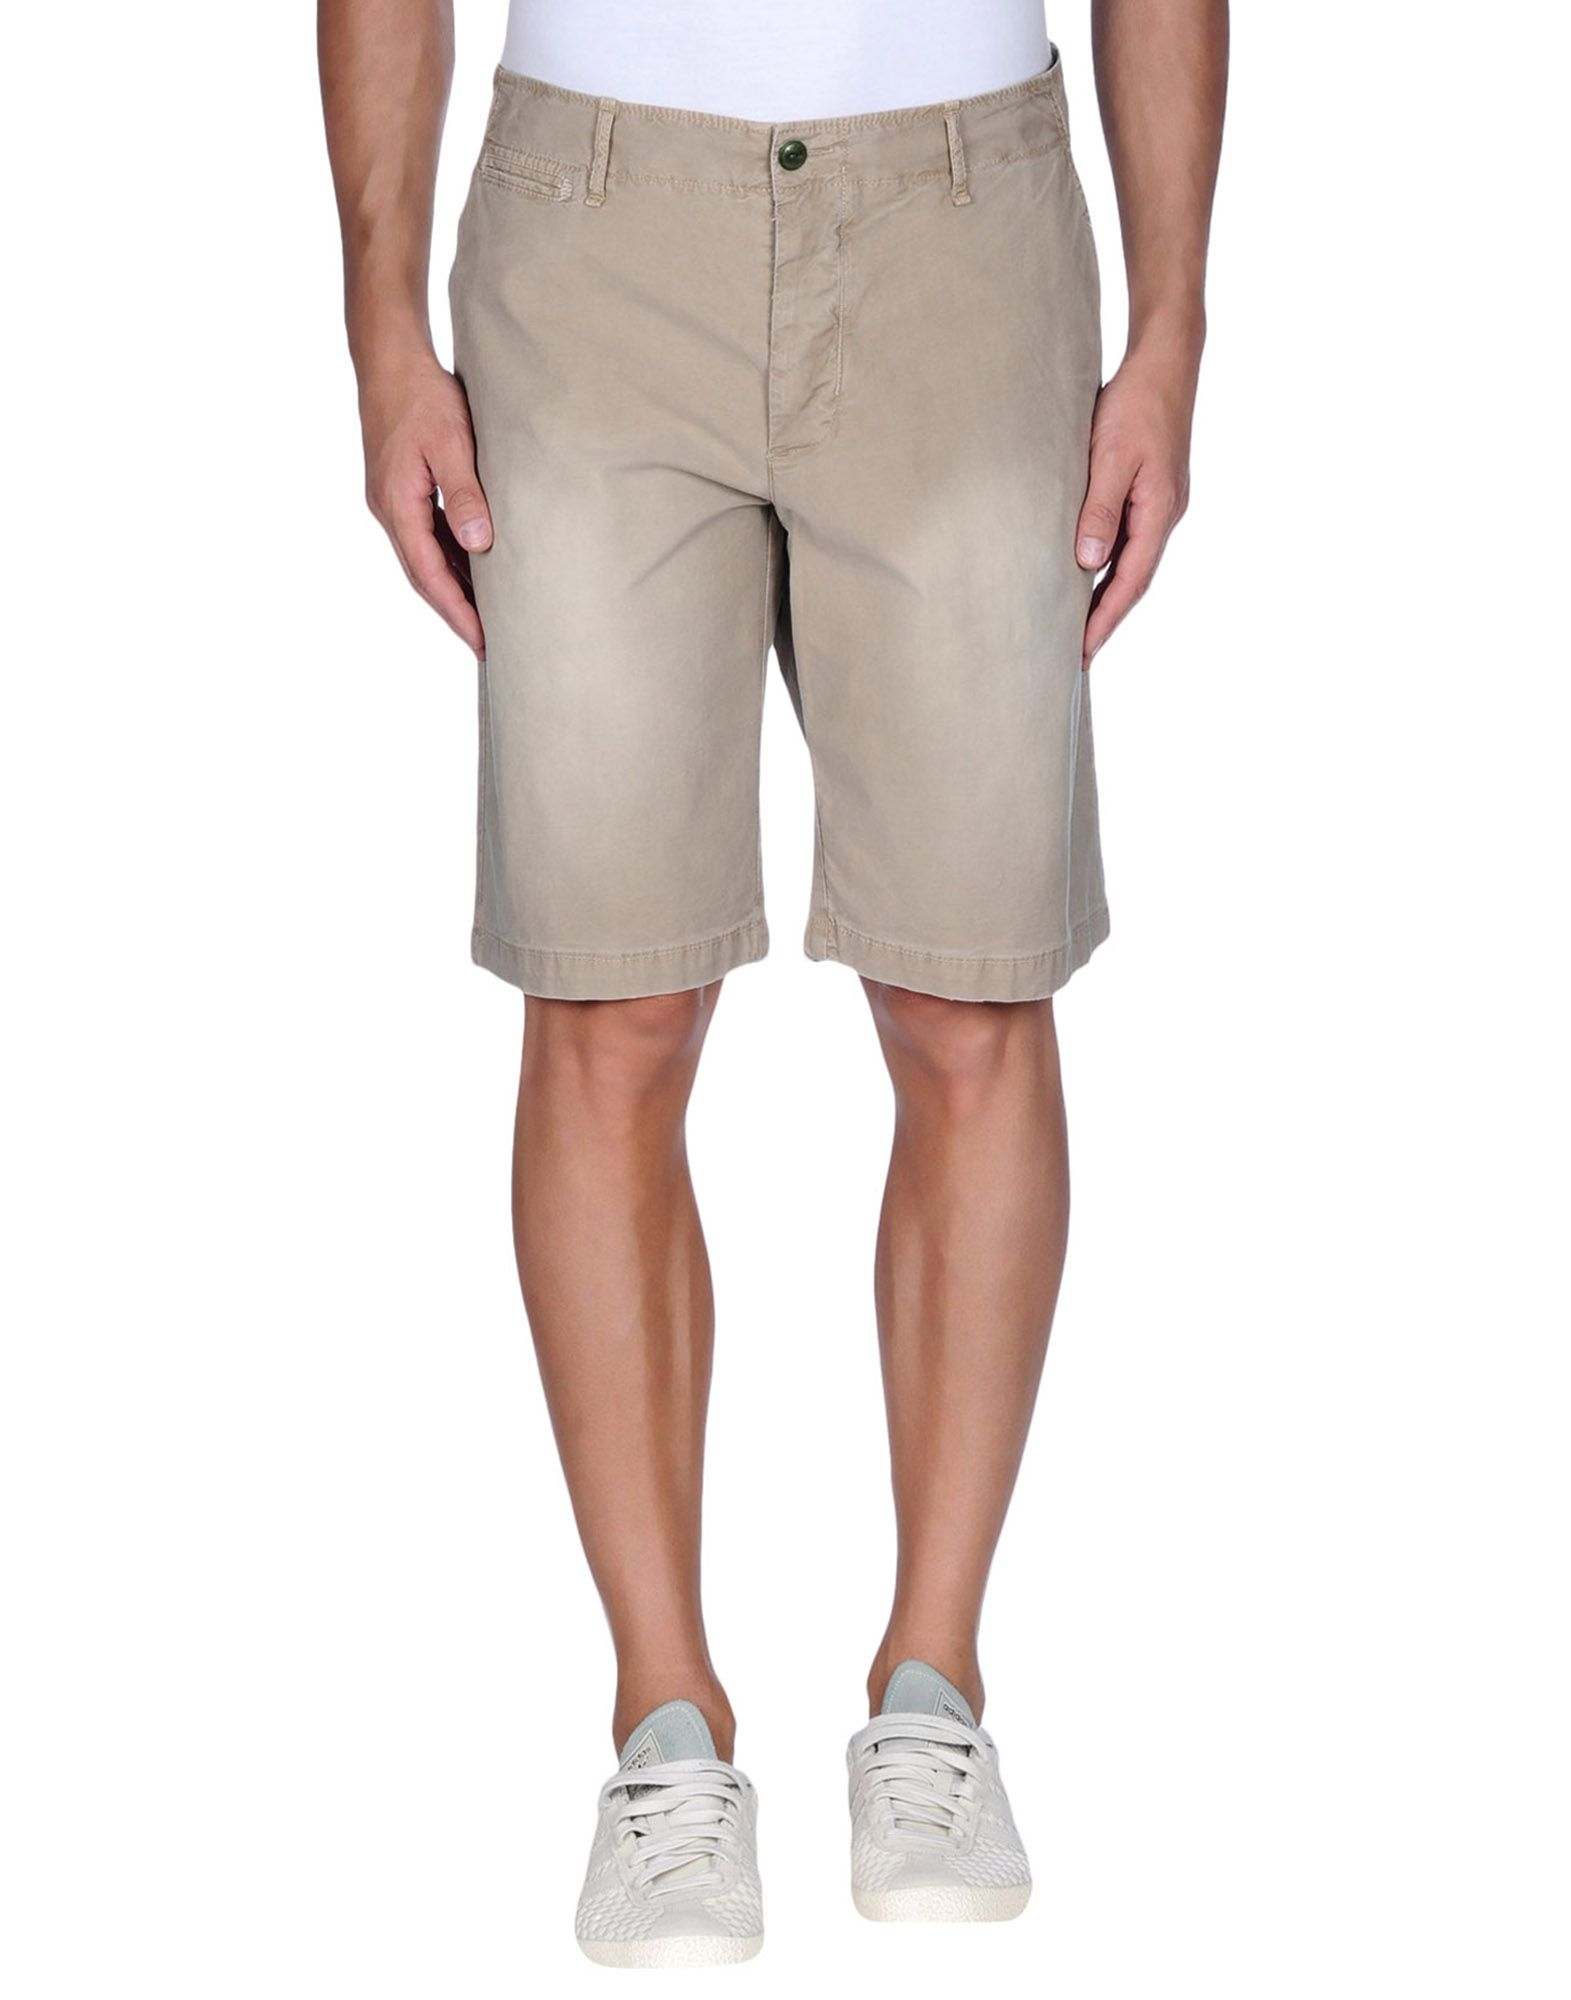 Bermuda Clothing and Dress Code